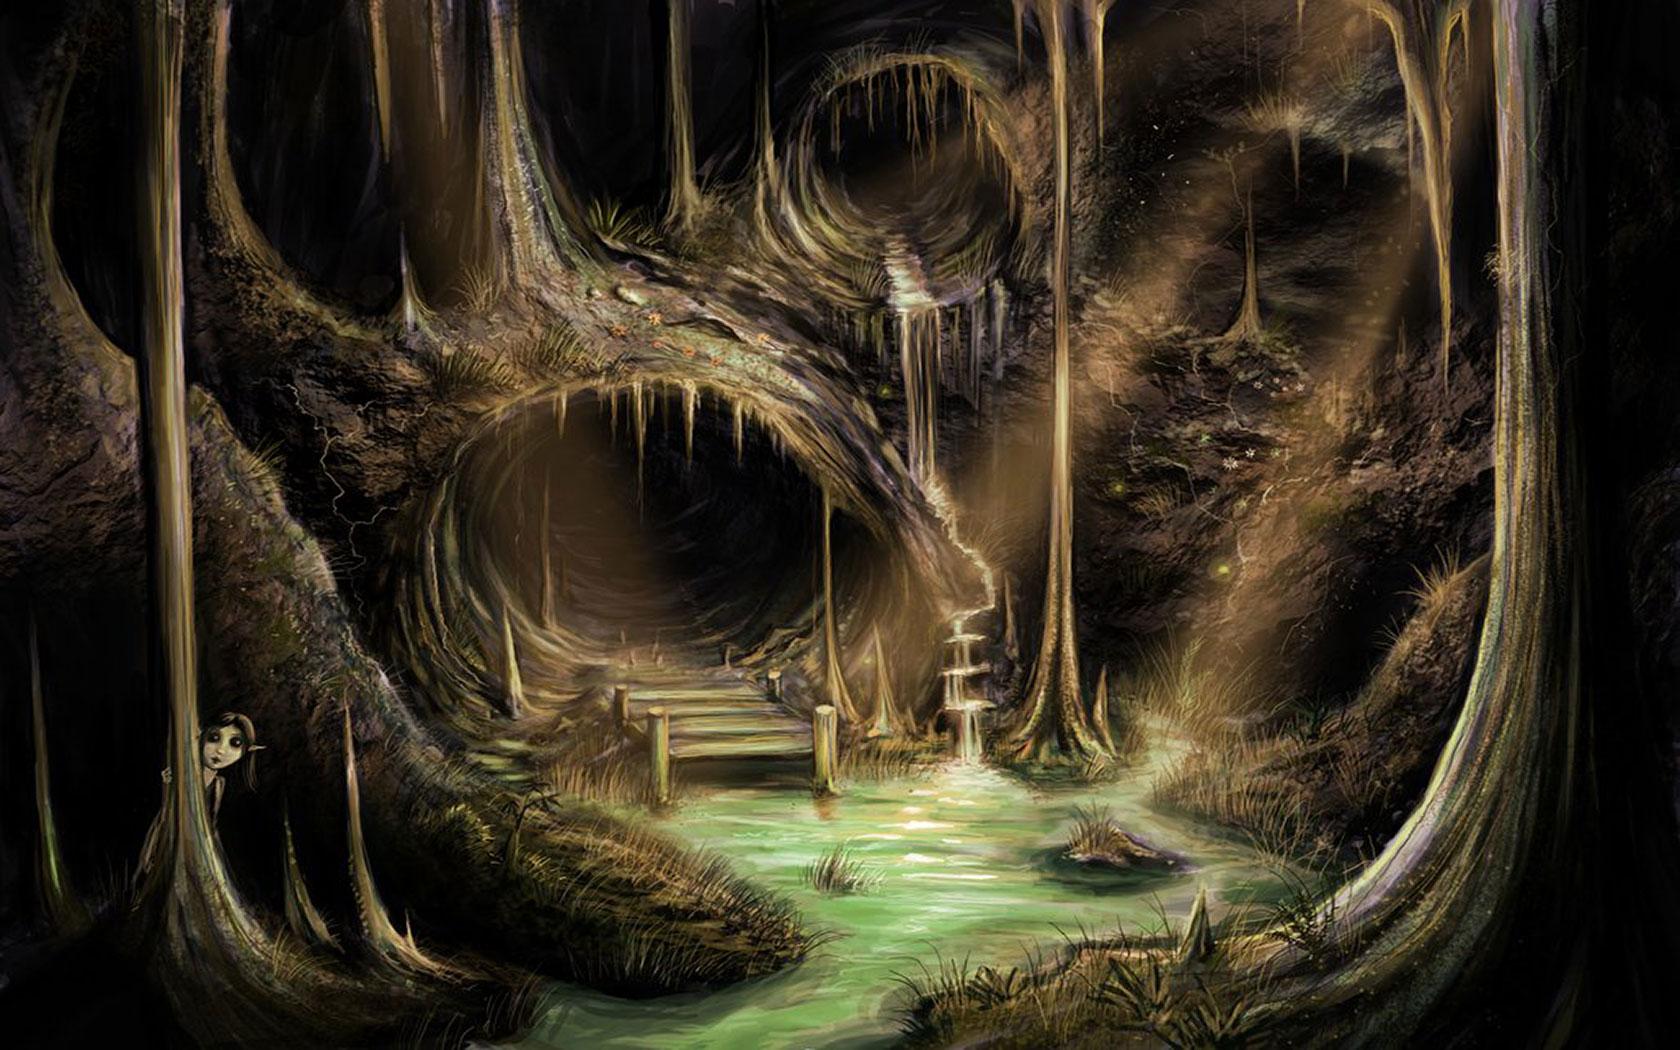 Illuminated Caves Computer Wallpaper